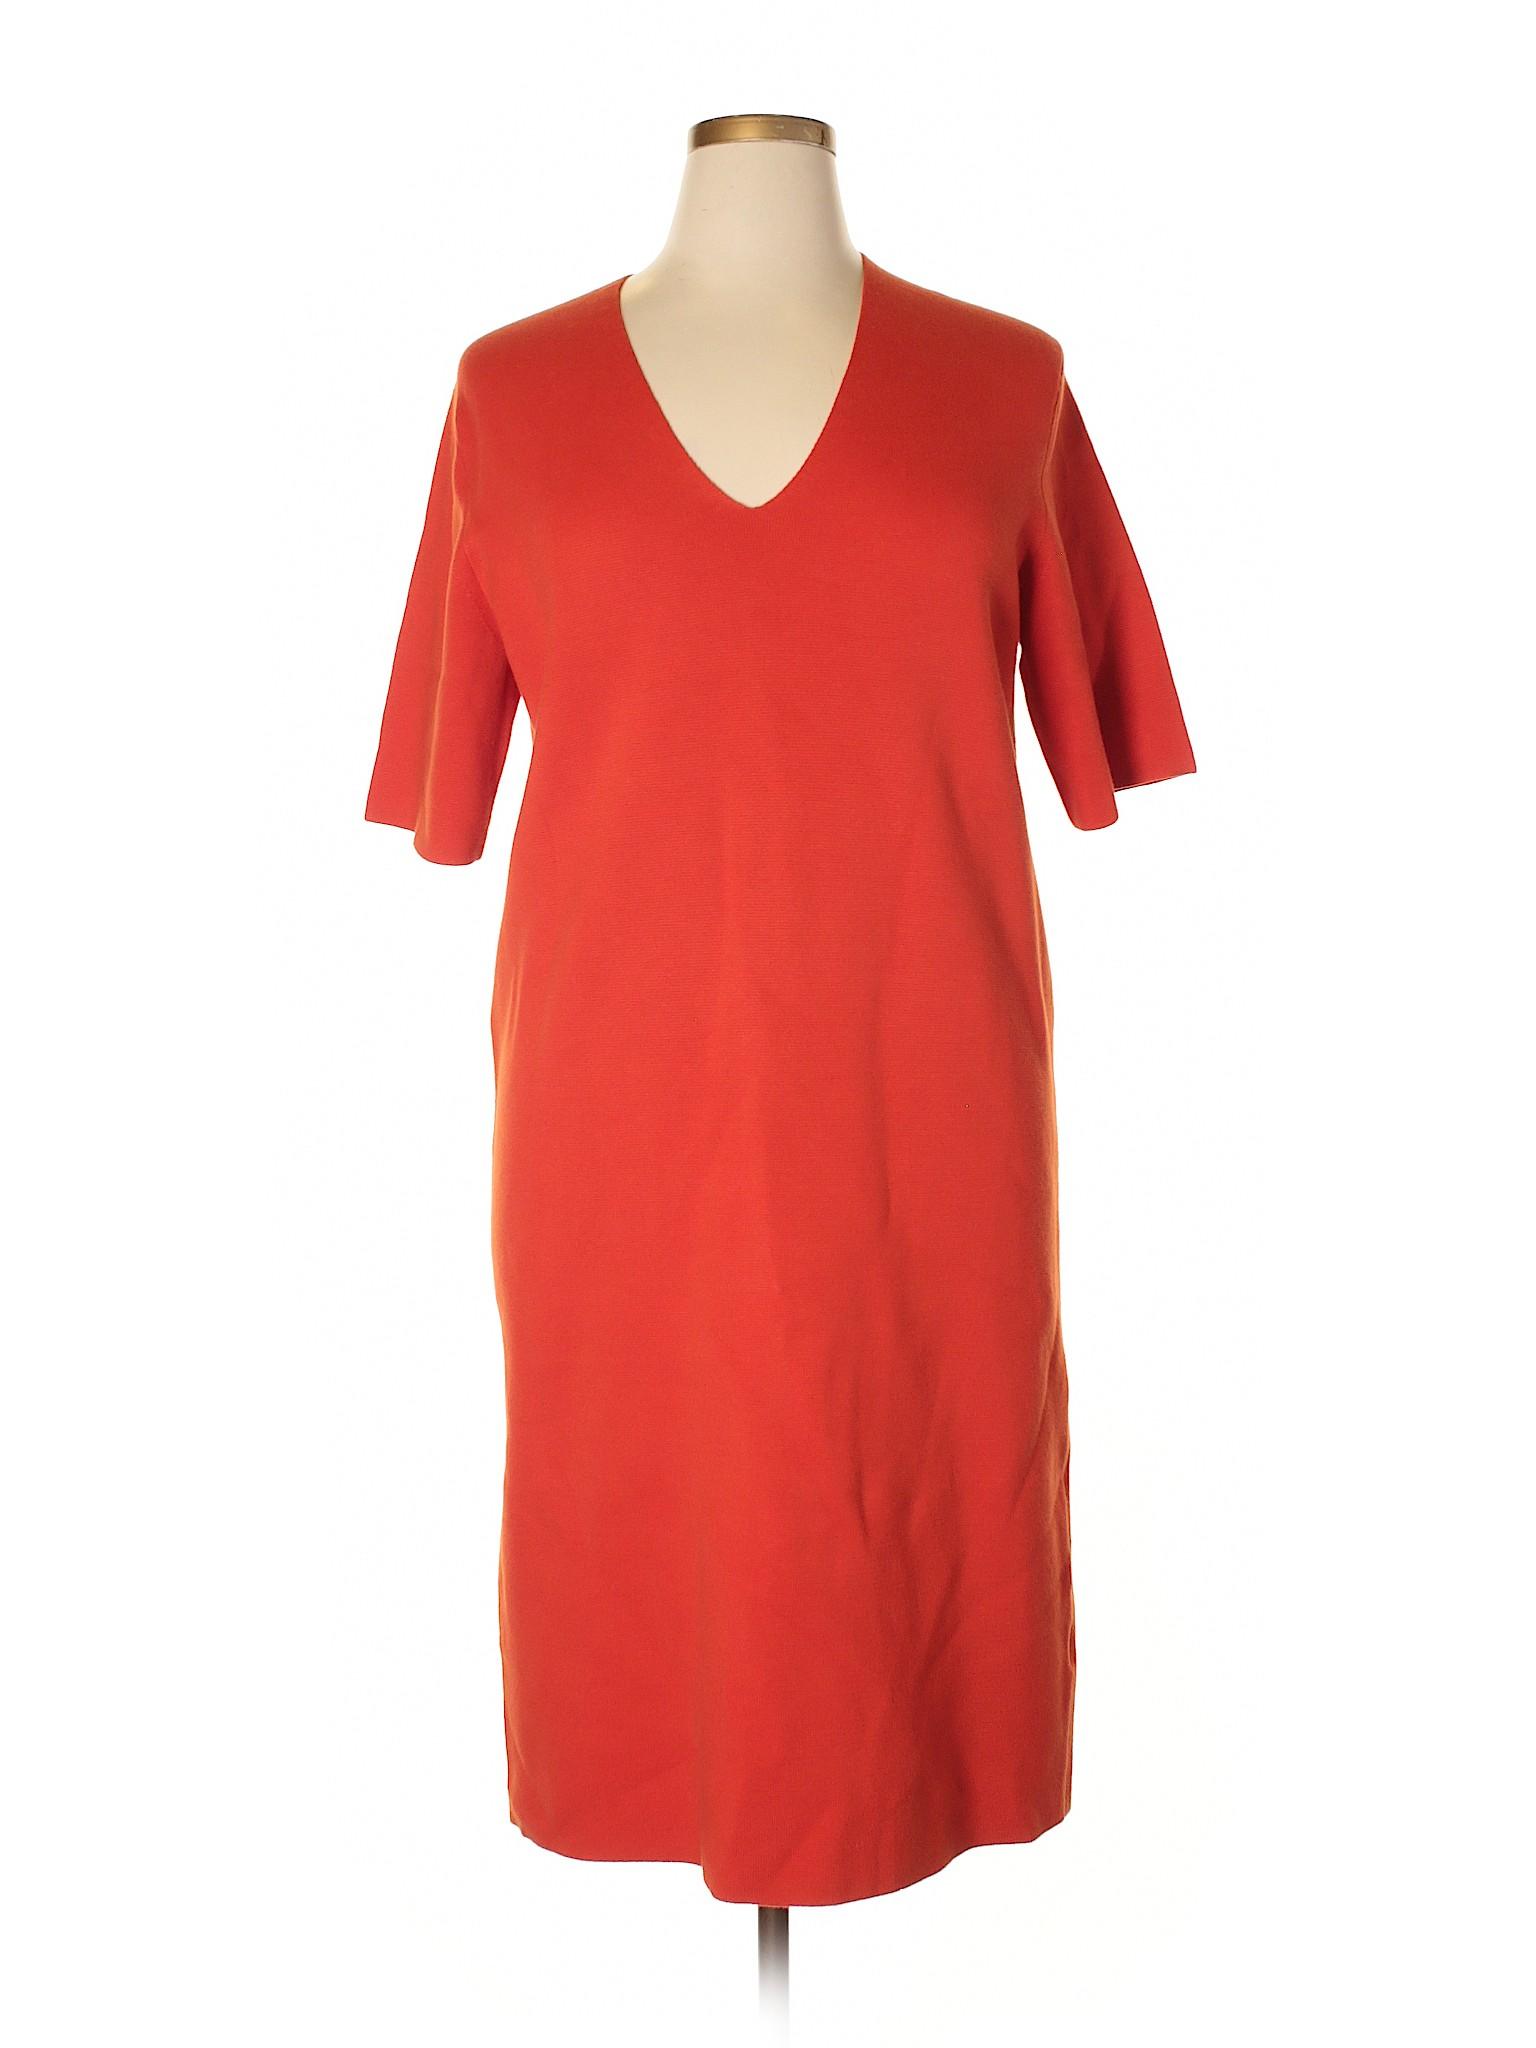 Uniqlo Selling Dress Casual Selling Uniqlo Uniqlo Casual Casual Dress Selling 4wUxdtqt